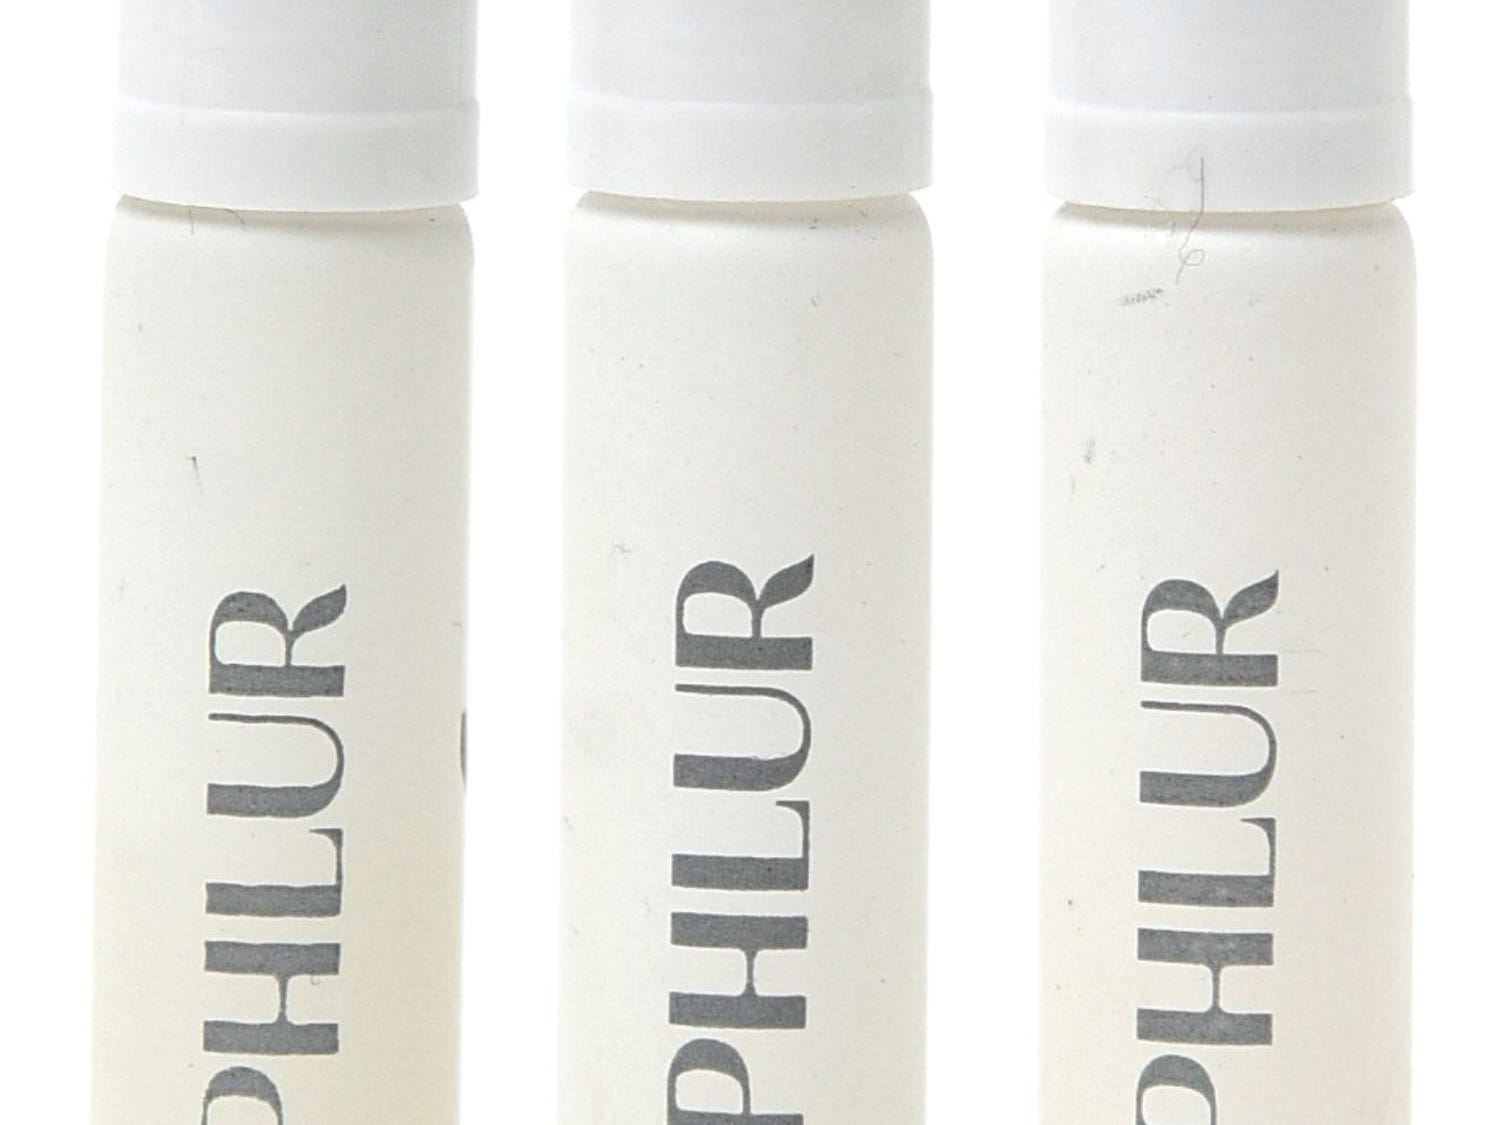 Favorite perfume: Phlur's Hanami, Greylocke and  Olmstead & Vaux; Kendall Marie Zoppa (201) Personal Style